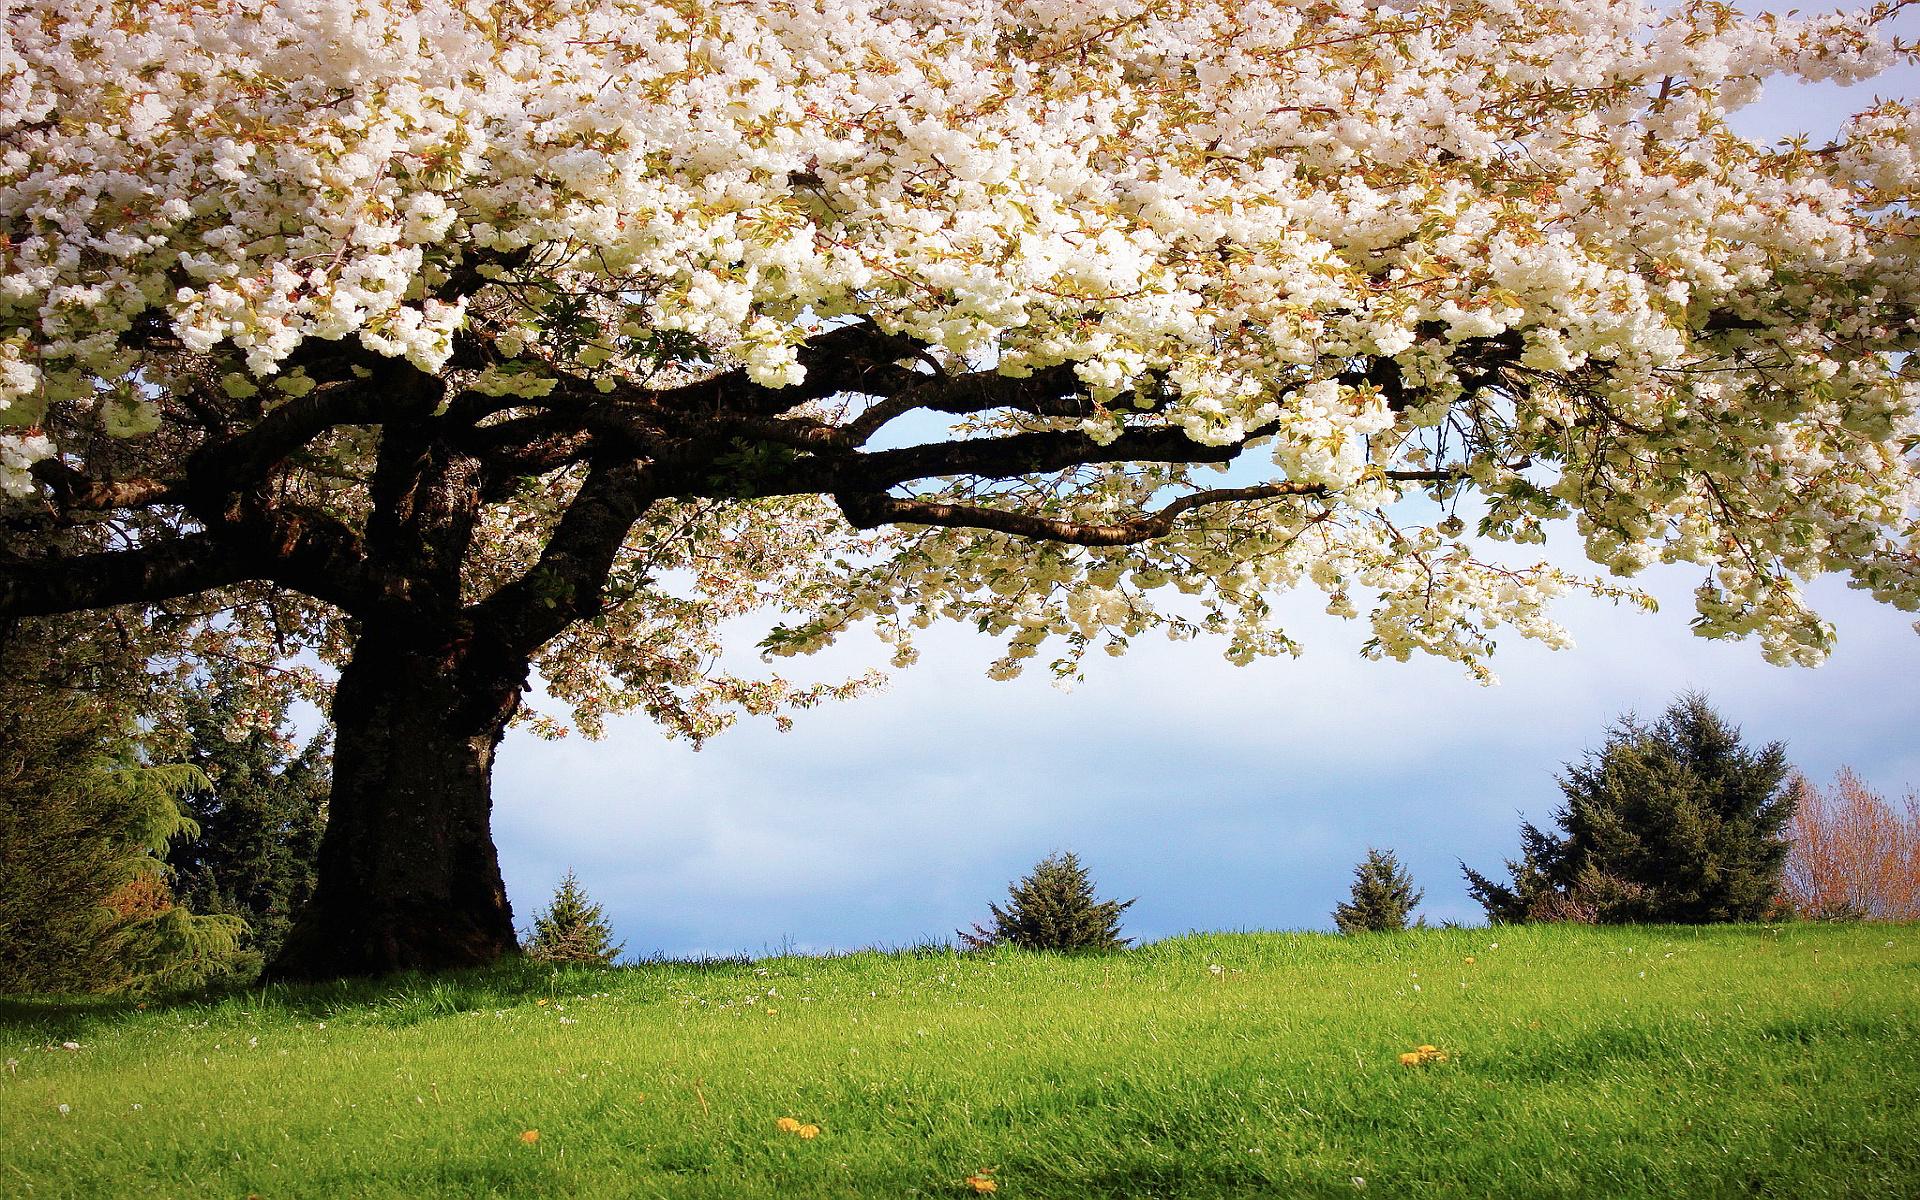 Spring cherry tree